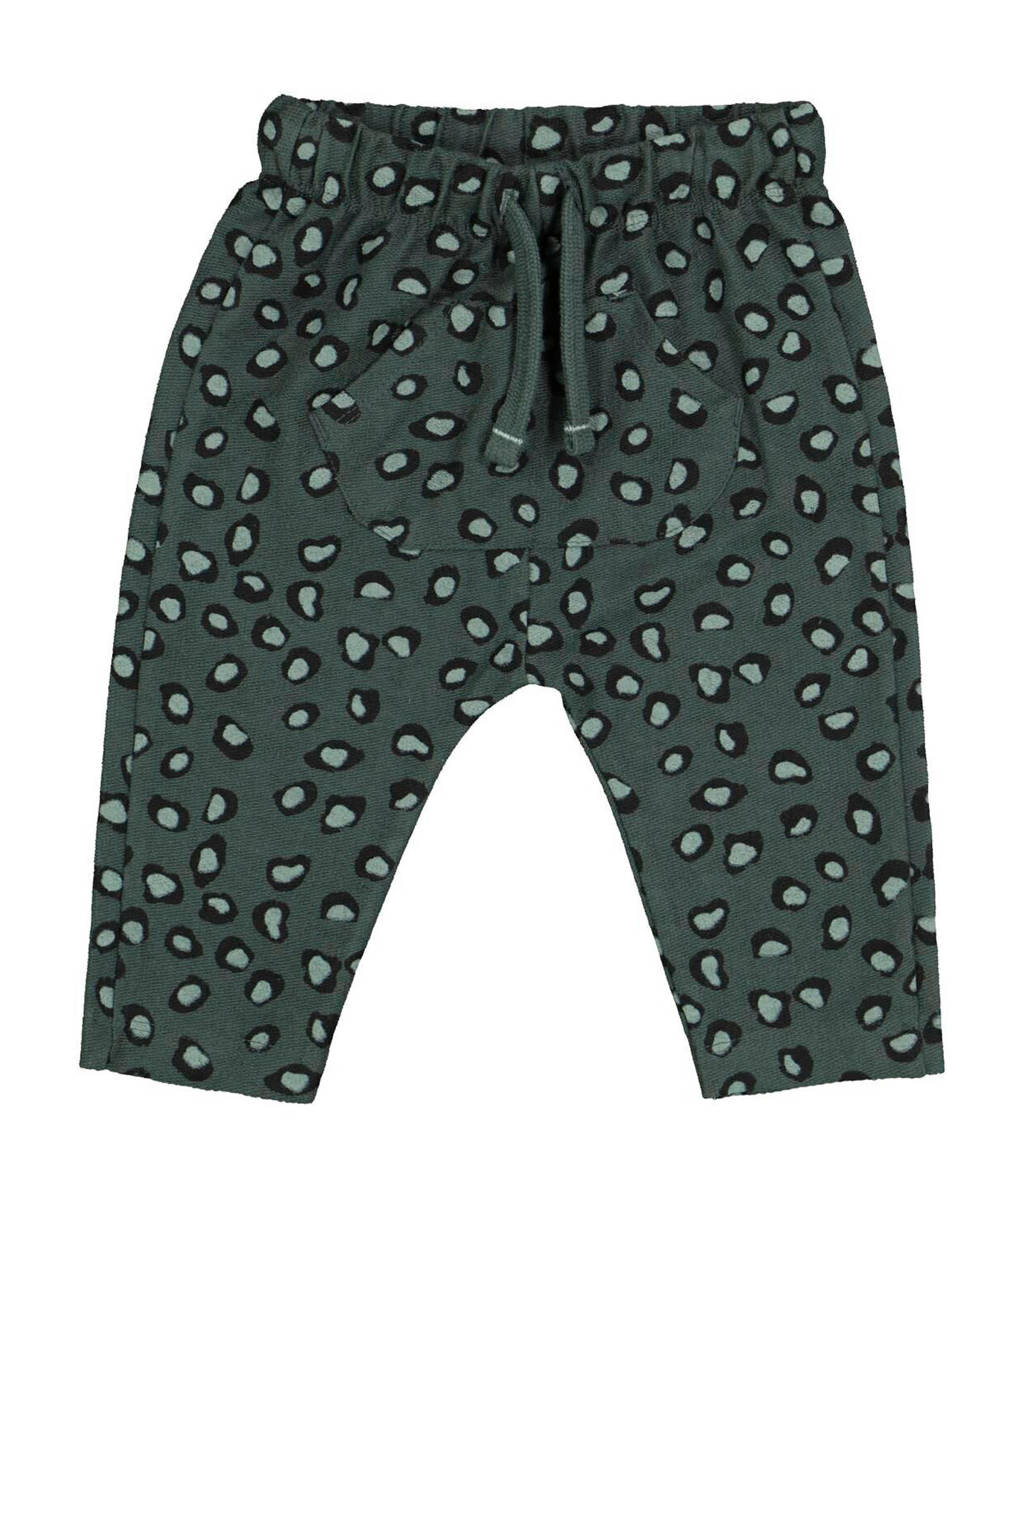 HEMA broek met panterprint groen, Groen